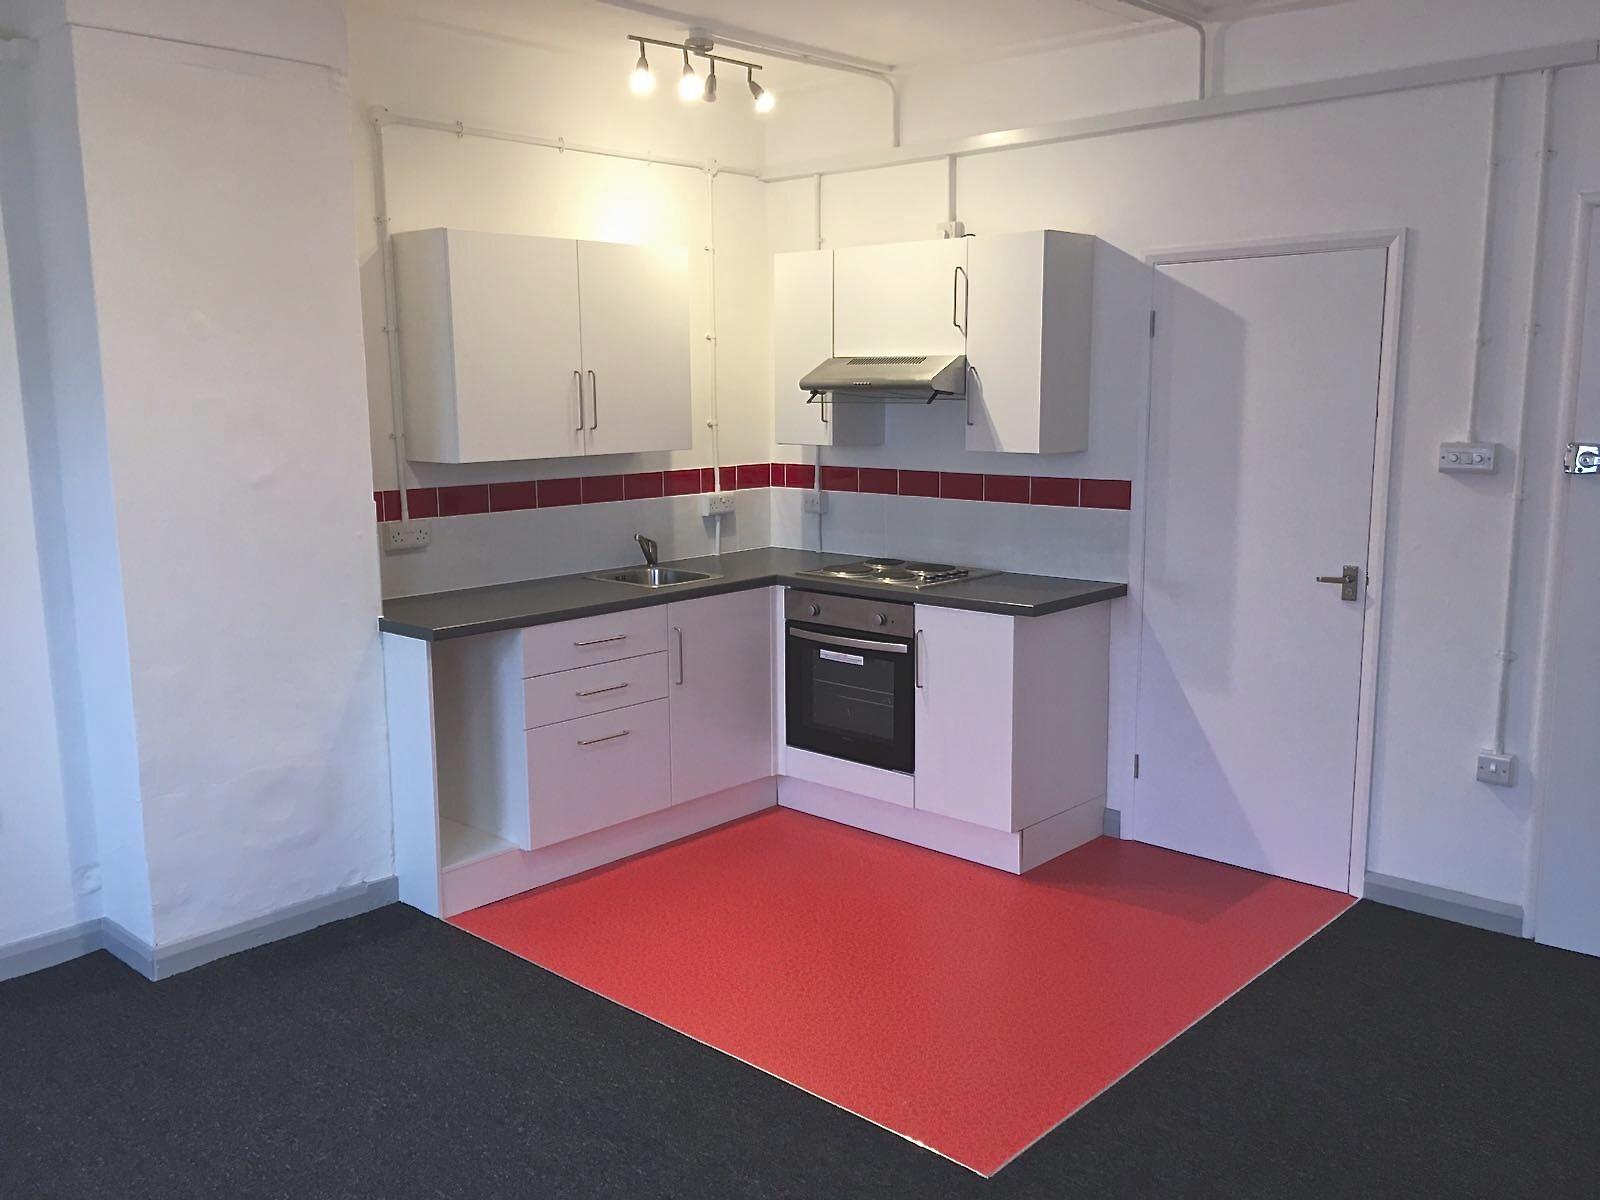 Kitchen Install in a Studio Flat